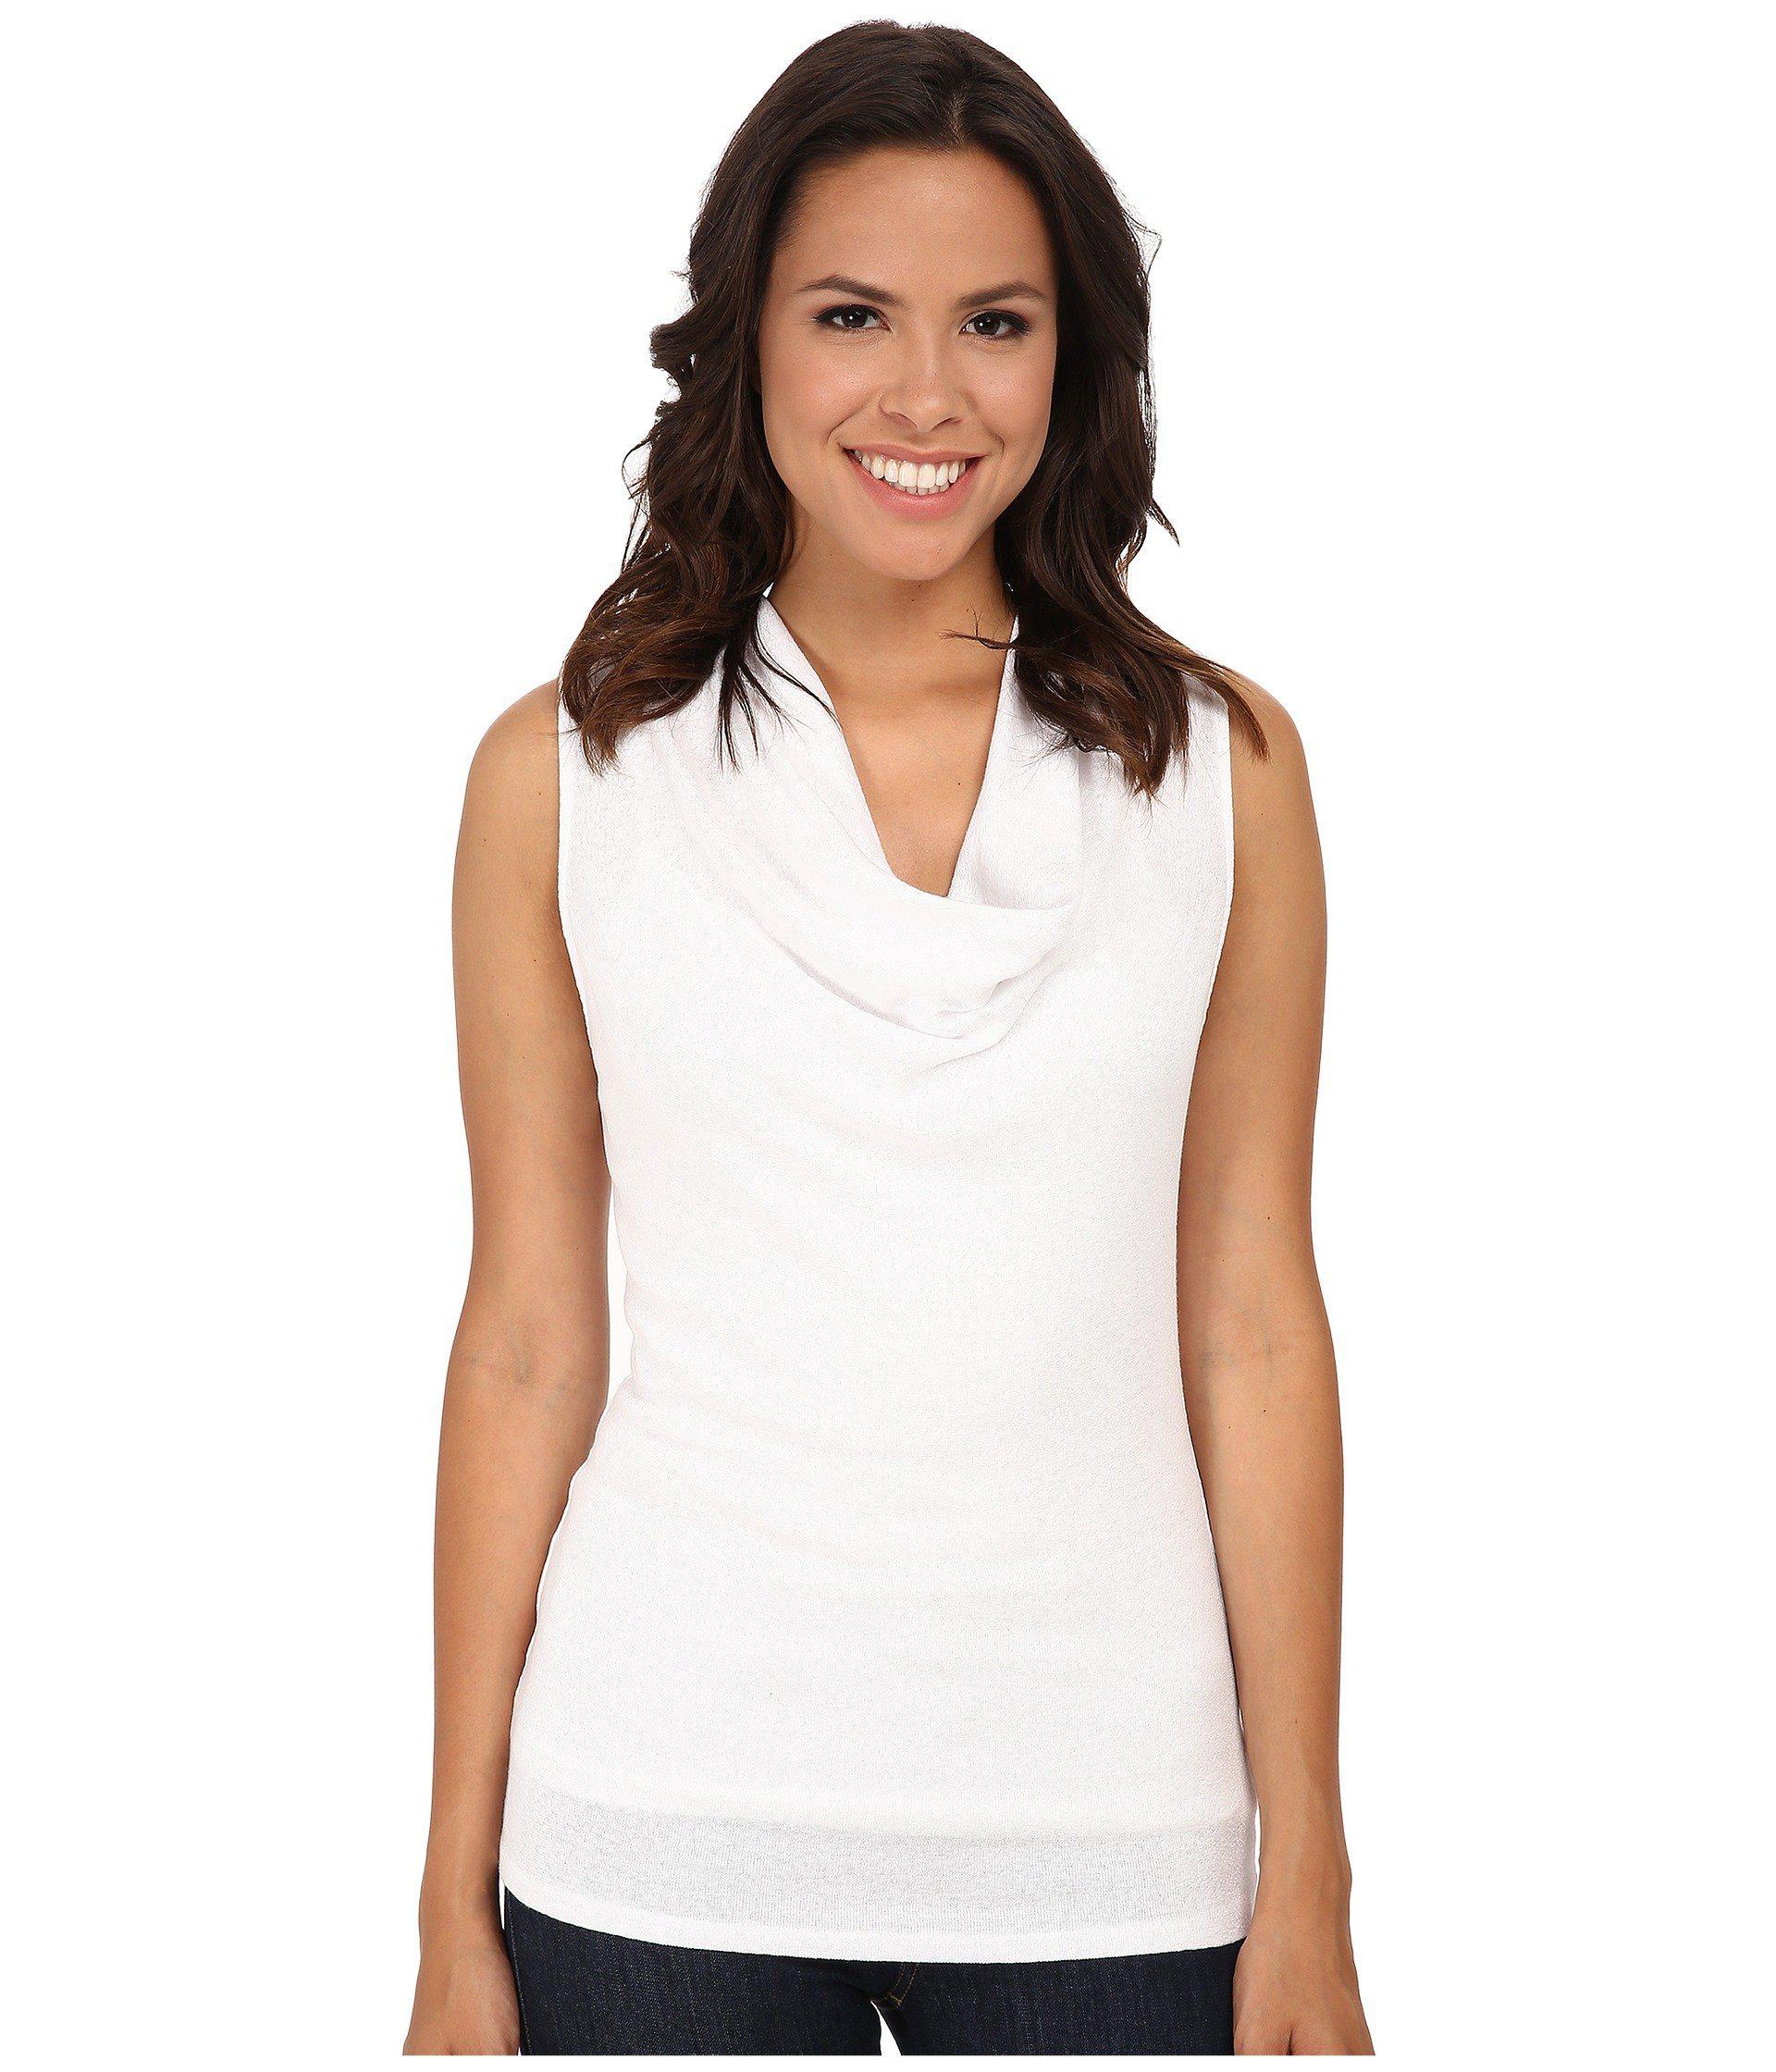 59a29706d7c Lyst - Michael Stars Shine Sleeveless Drape Neck in White - Save 29%